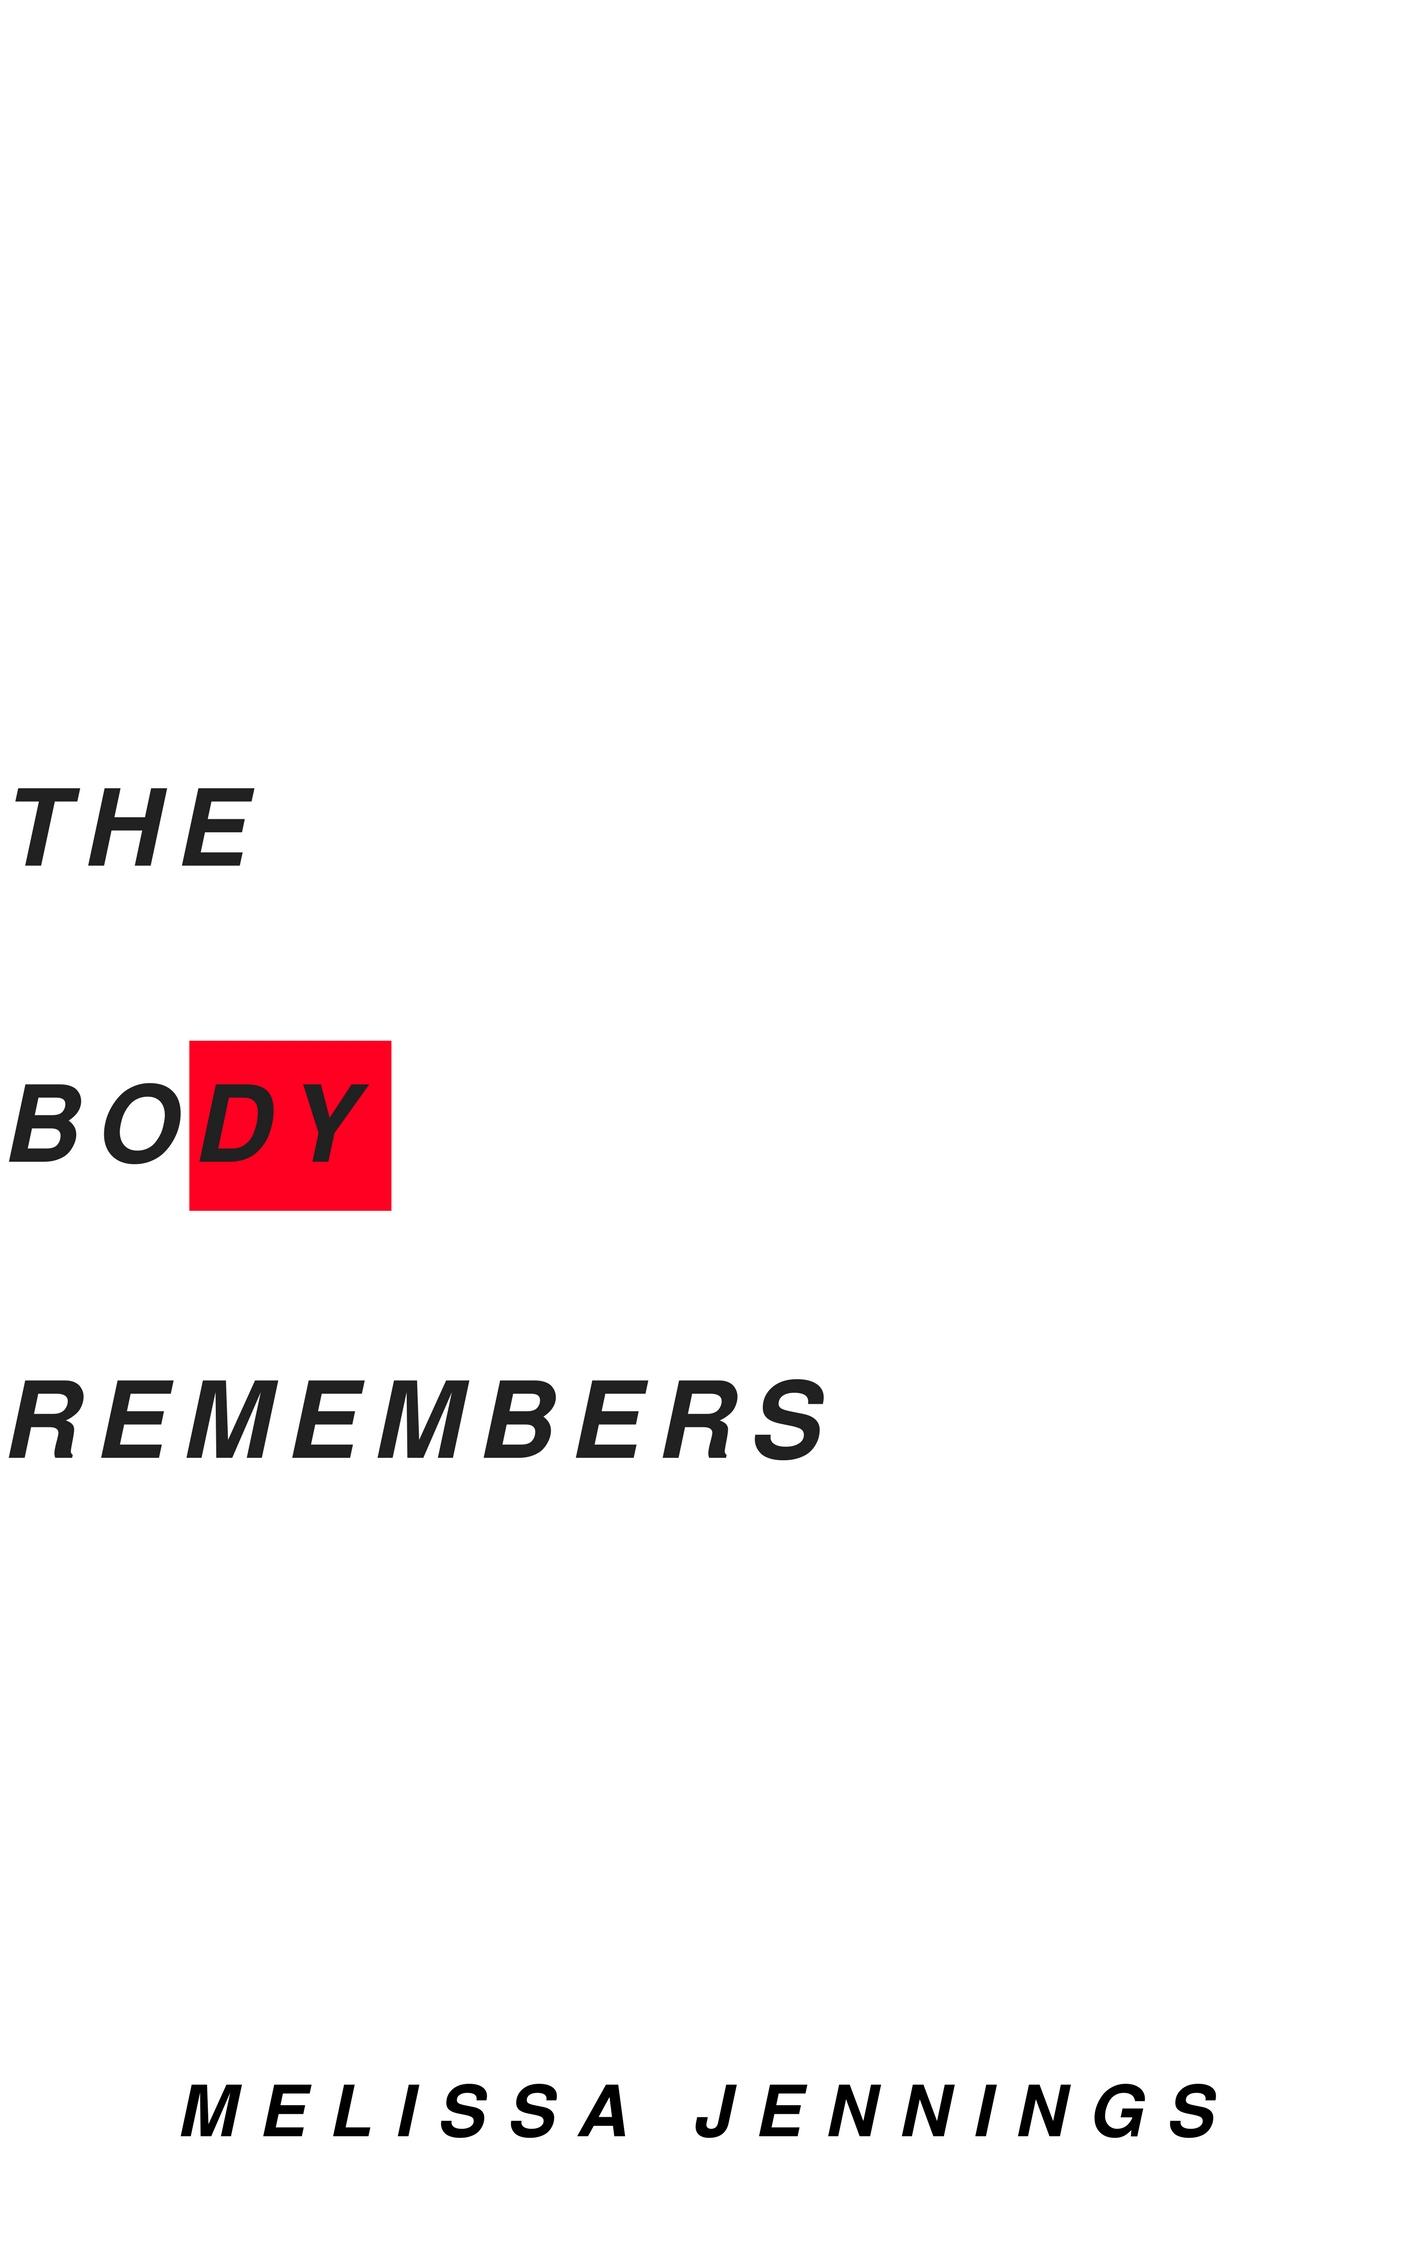 THE BODY REMEMBERS FINAL.jpg